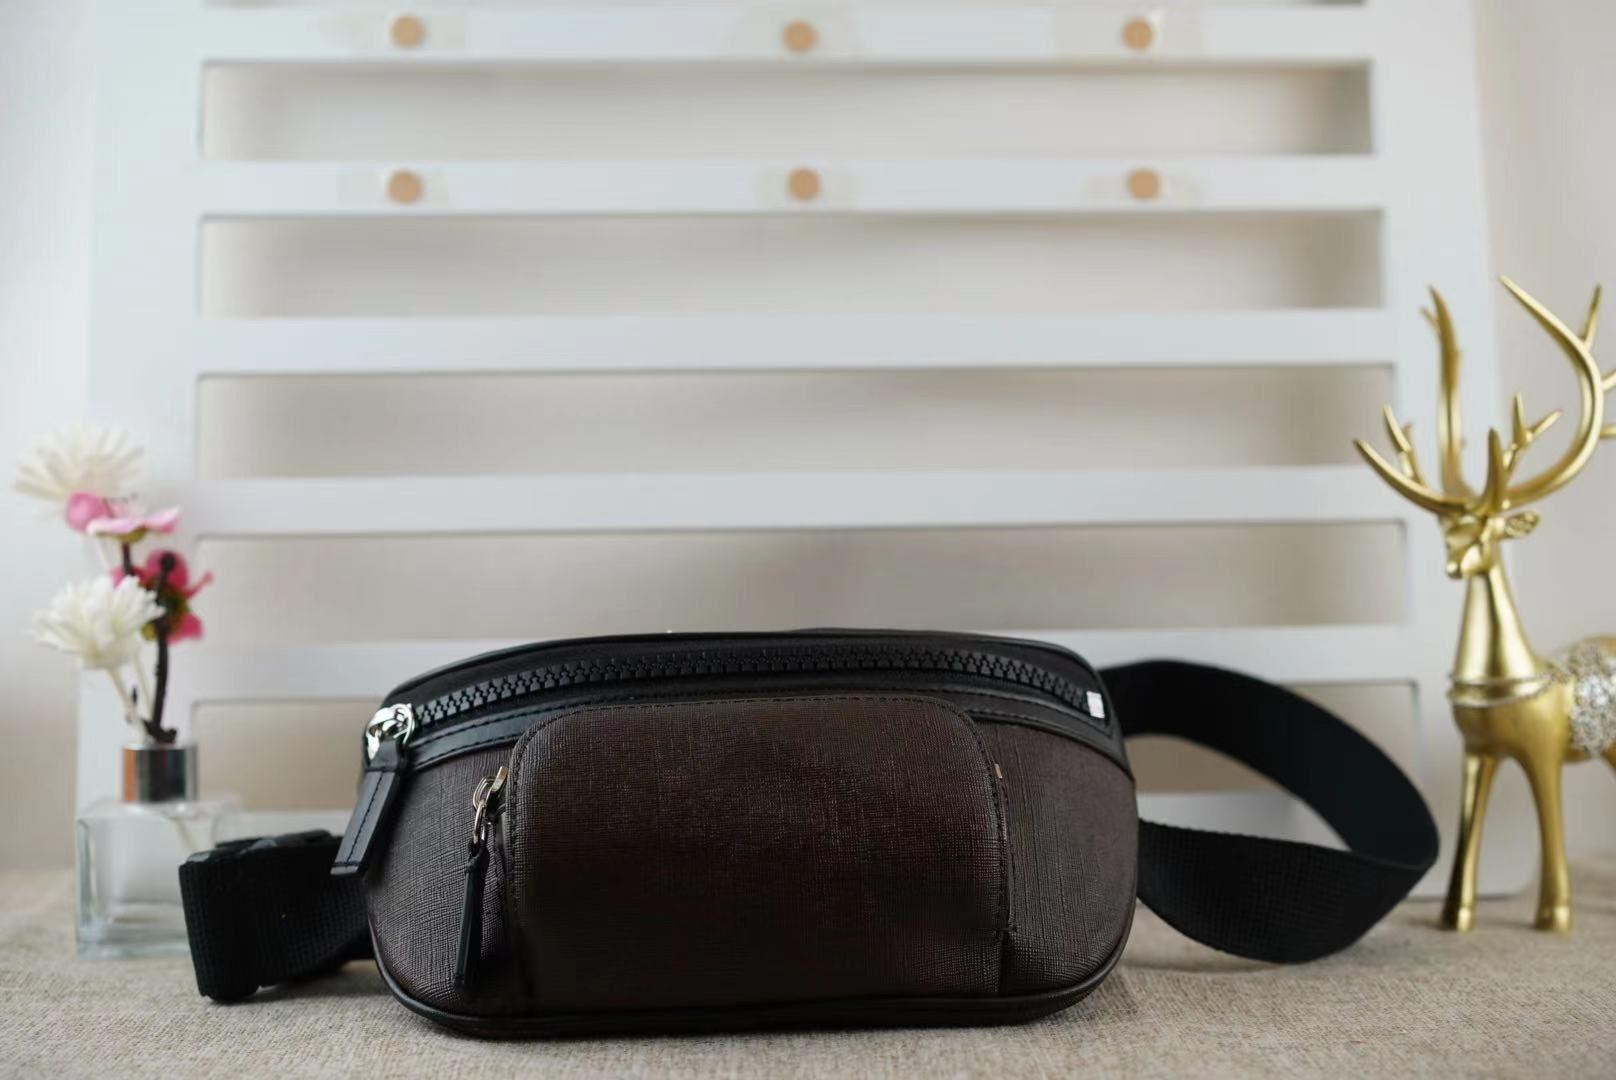 2020 New Pockette Bolso Bag embreagem Bag Baguette Bag Entre com Box Homens Woemen Handbad Man Hot Fashion USA Europ